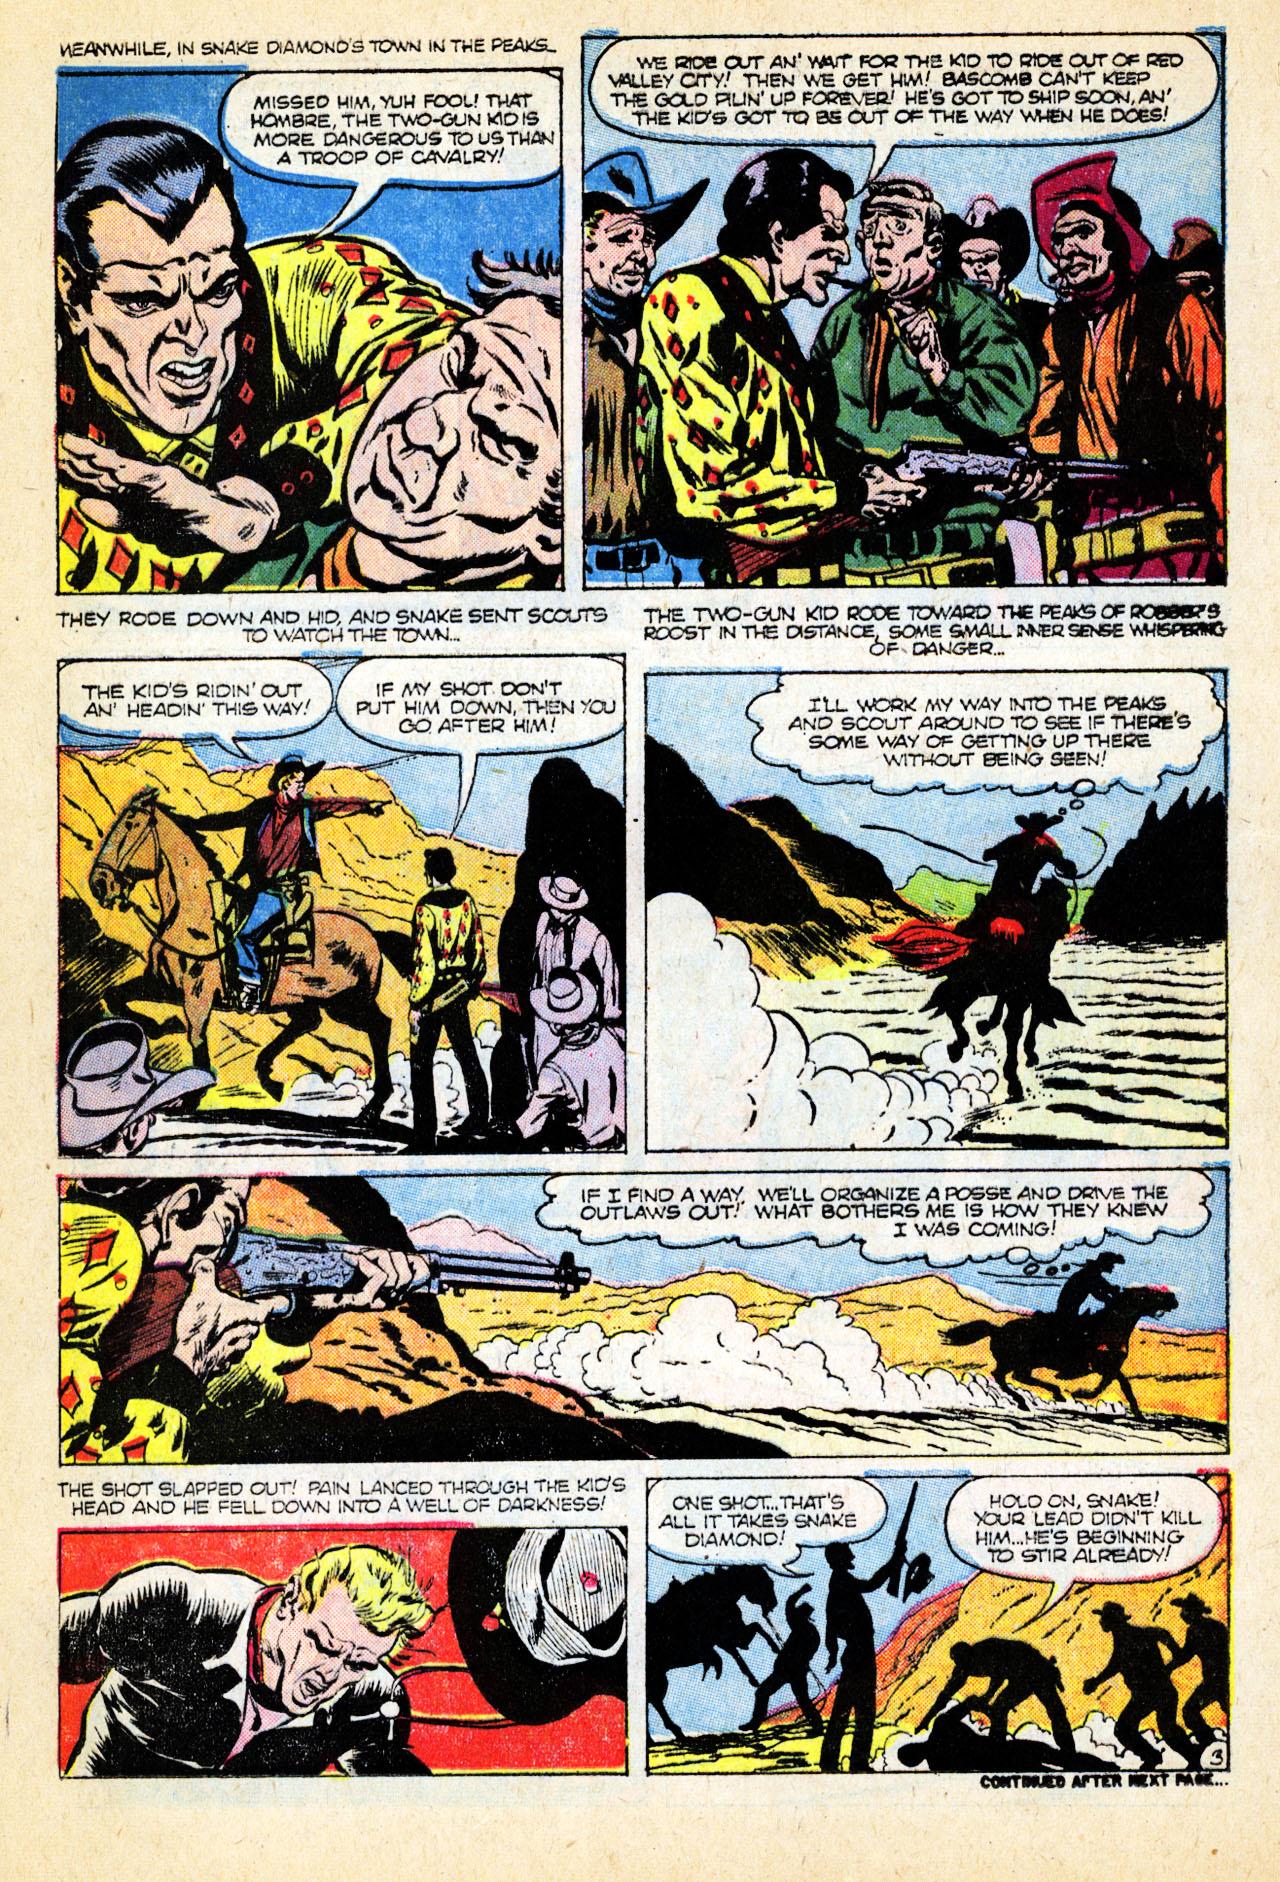 Read online Two-Gun Kid comic -  Issue #26 - 12